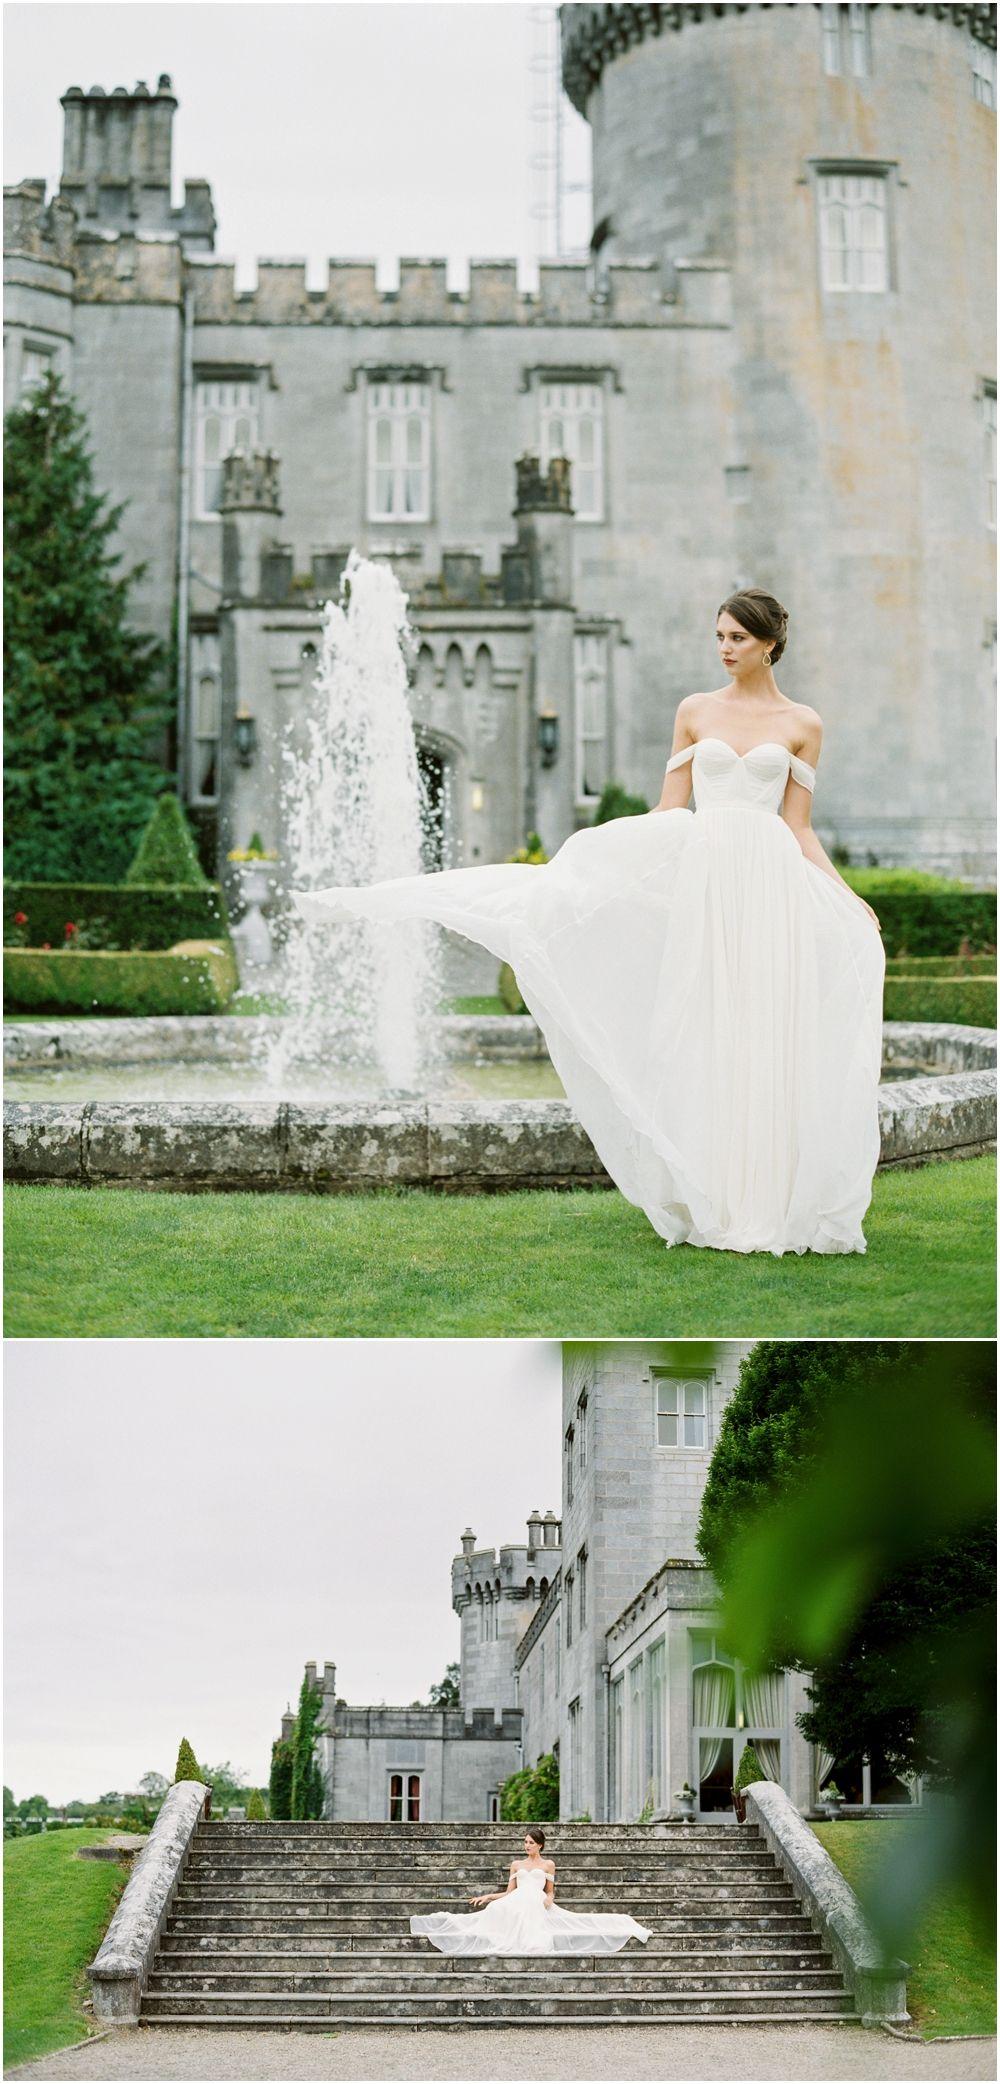 Pin by Katie Lee on wedding photography | Pinterest | Ireland ...